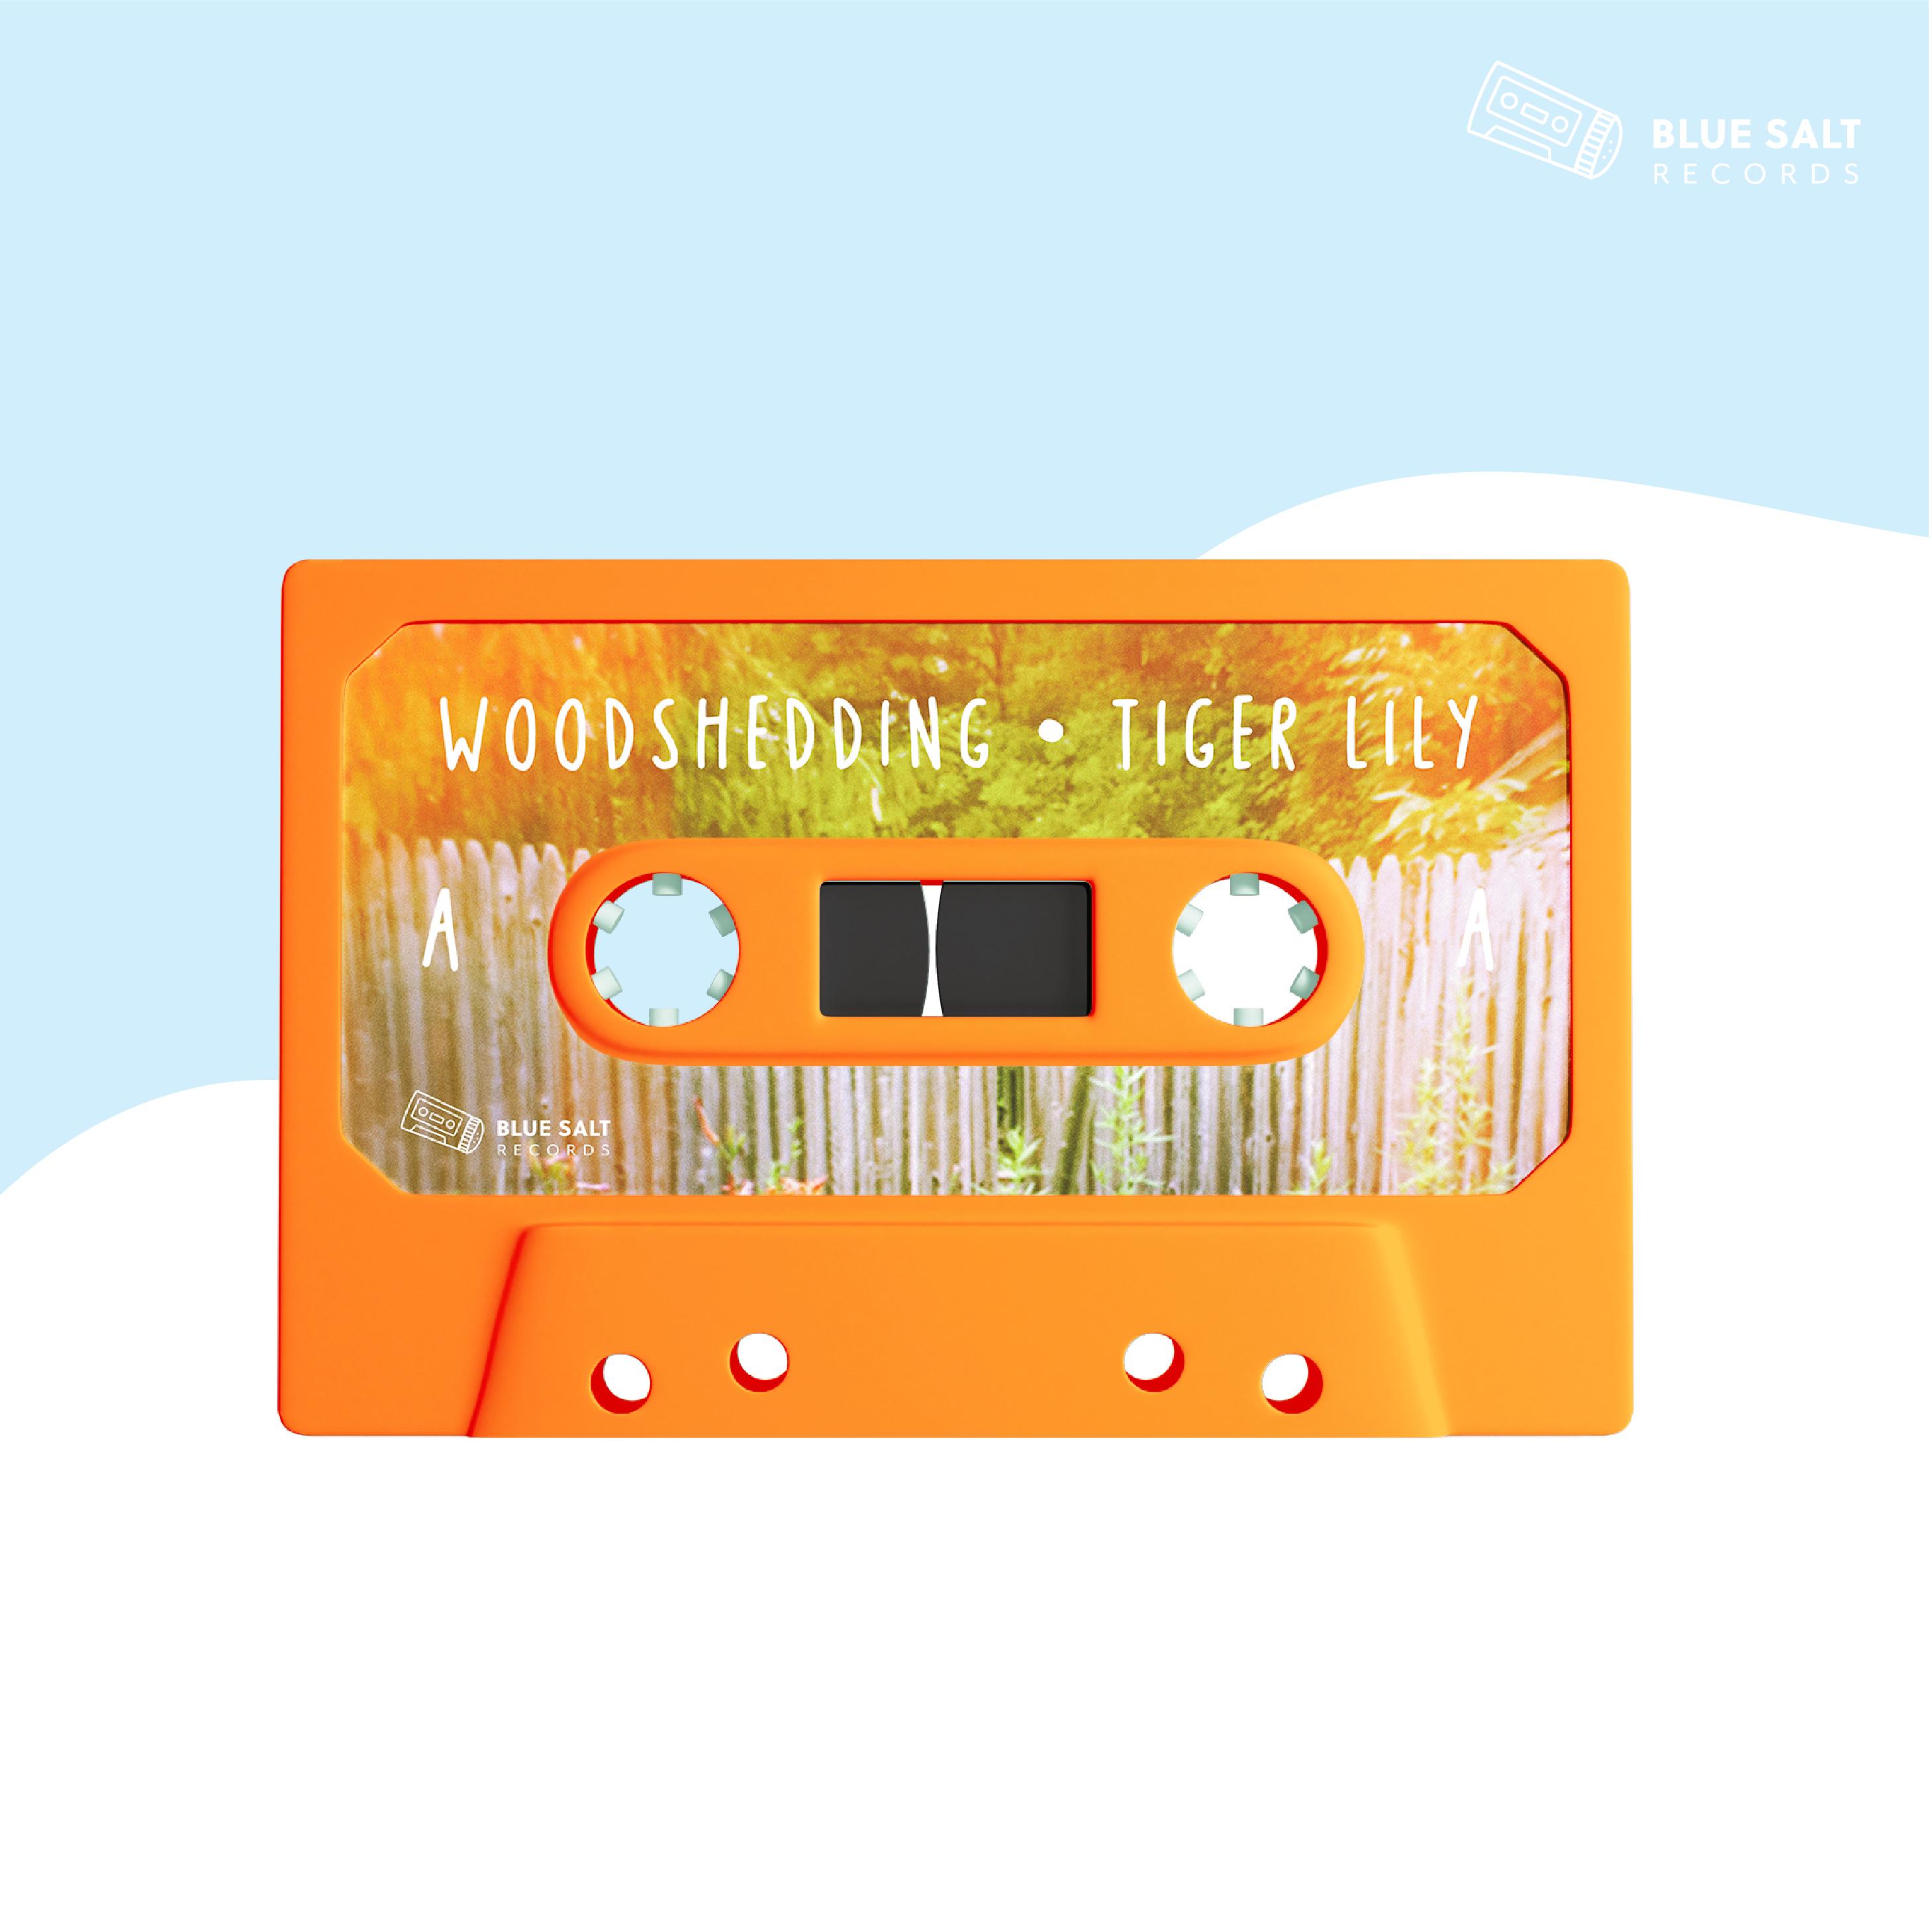 Woodshedding - Tiger Lily